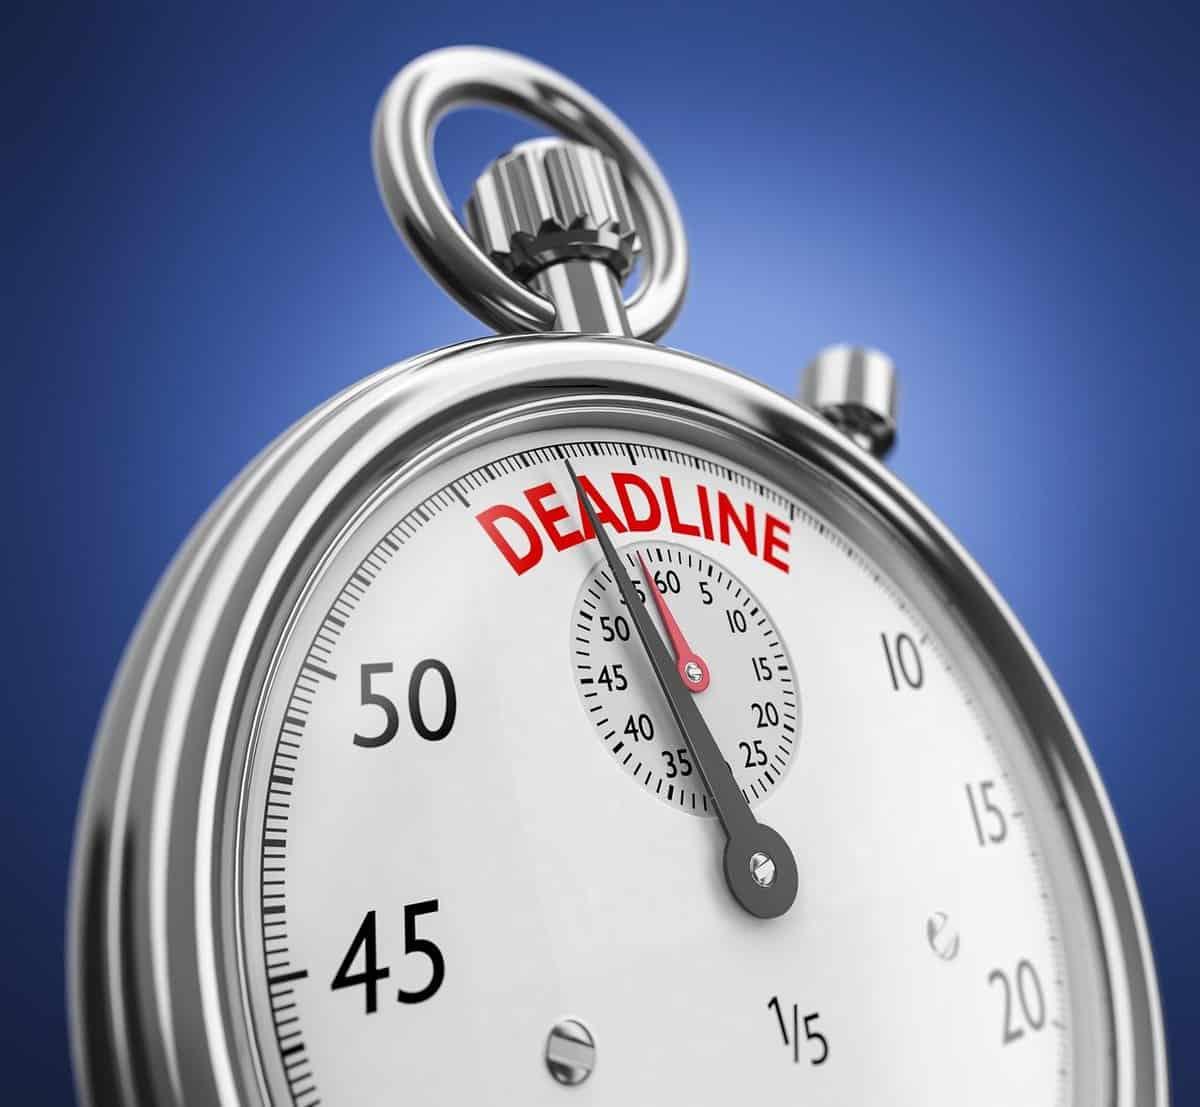 Self assessment deadline approaching